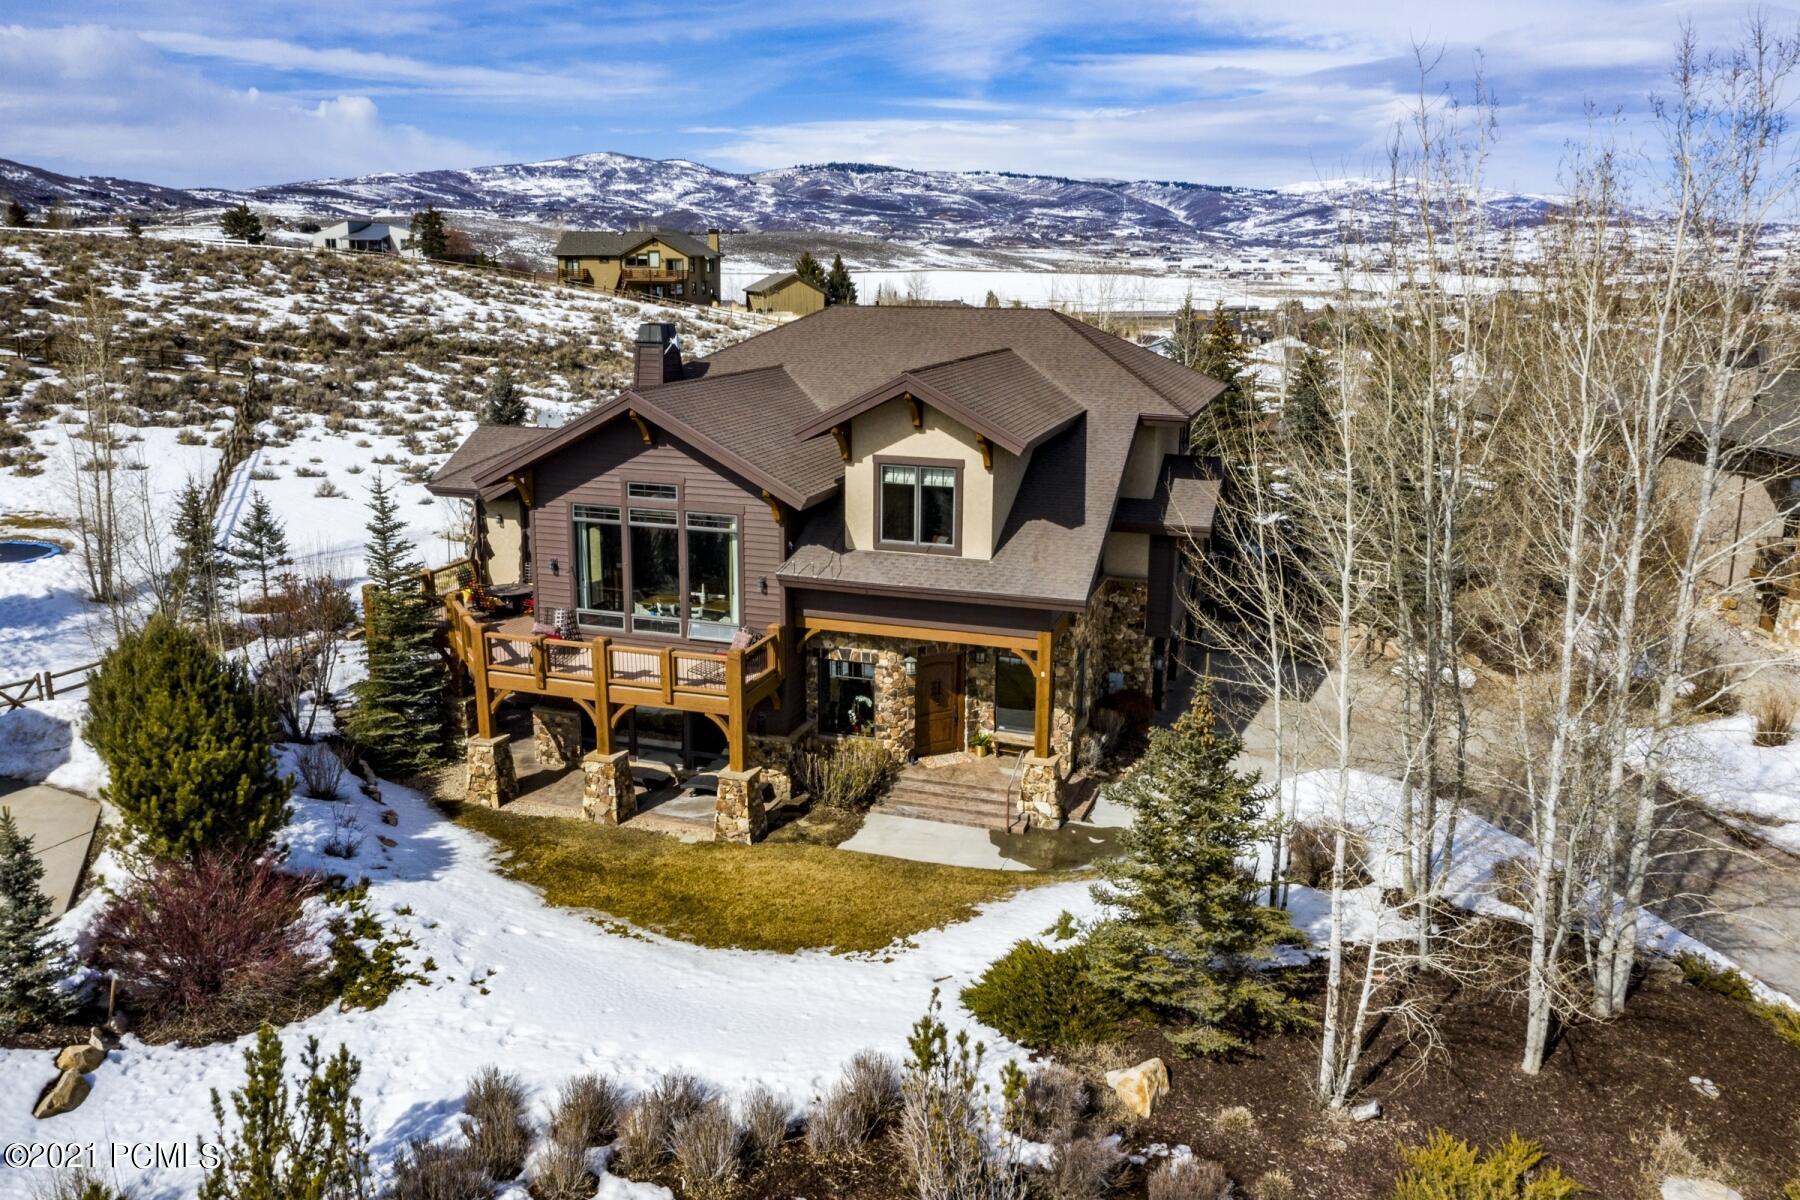 6140 Trailside Drive, Park City, Utah 84098, 4 Bedrooms Bedrooms, ,5 BathroomsBathrooms,Single Family,For Sale,Trailside,12100912